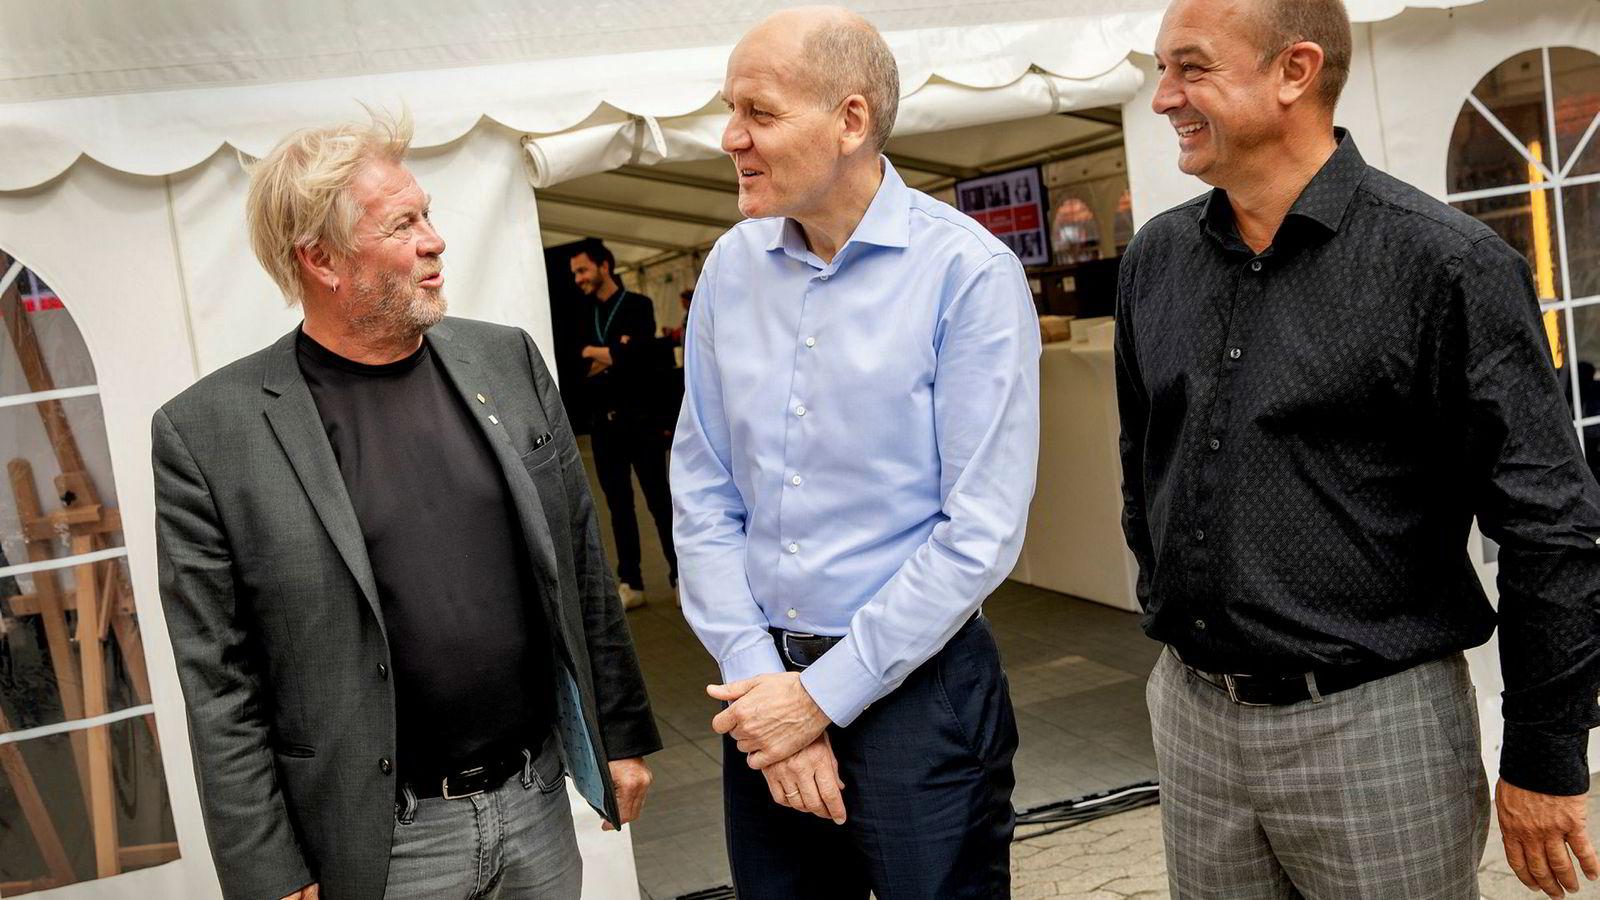 Fra venstre: Professor og leder for NTNU Digital Torbjørn Svendsen ved NTNU, konsernsjef Sigve Brekke i Telenor og prorektor Kenneth Fjell ved NHH.